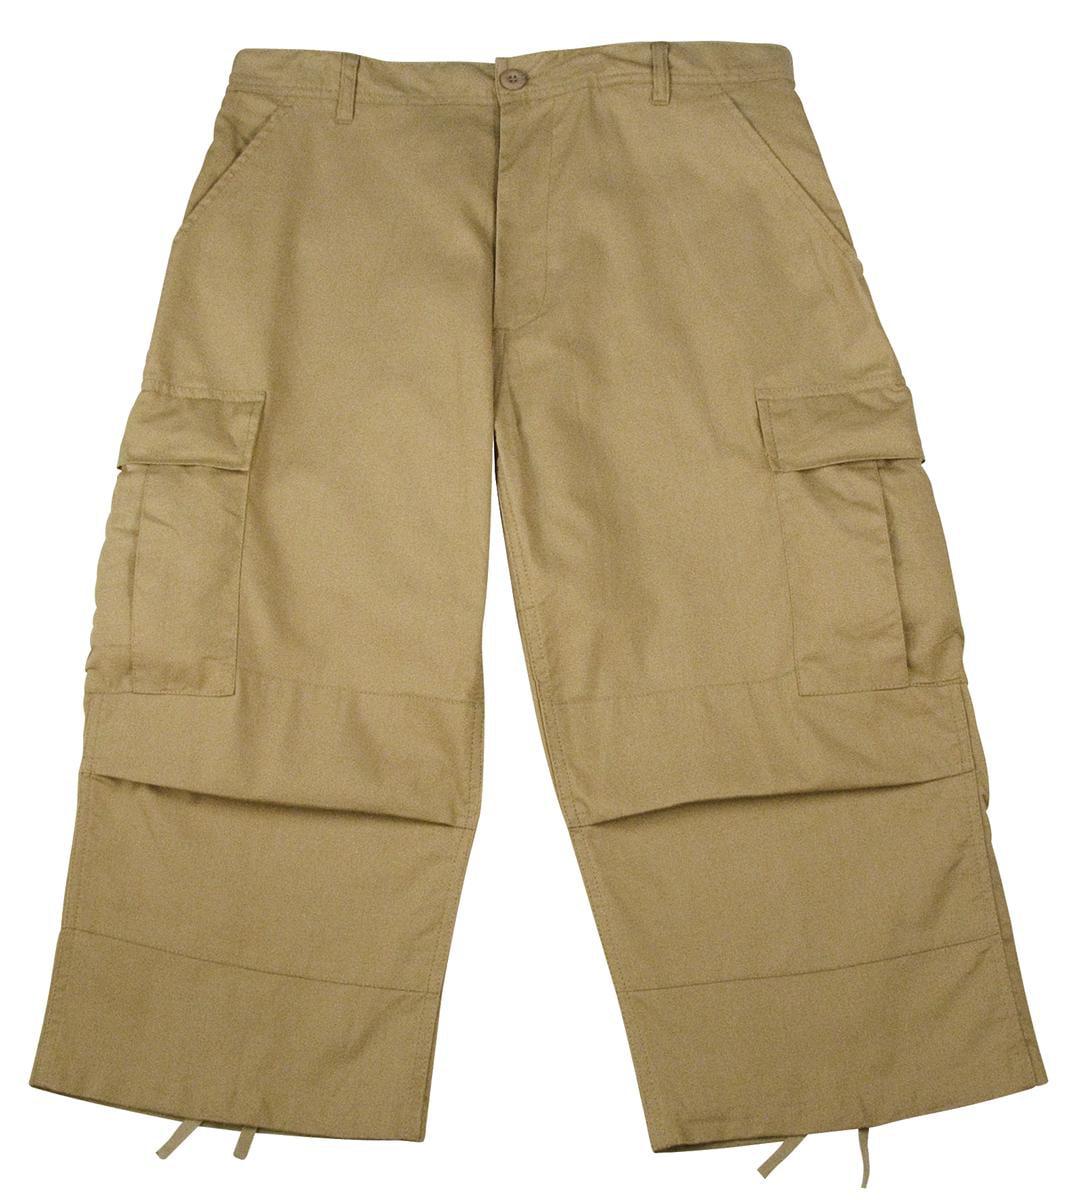 Mens Khaki Cropped Capri Pants w/Cargo Pockets - Walmart.com